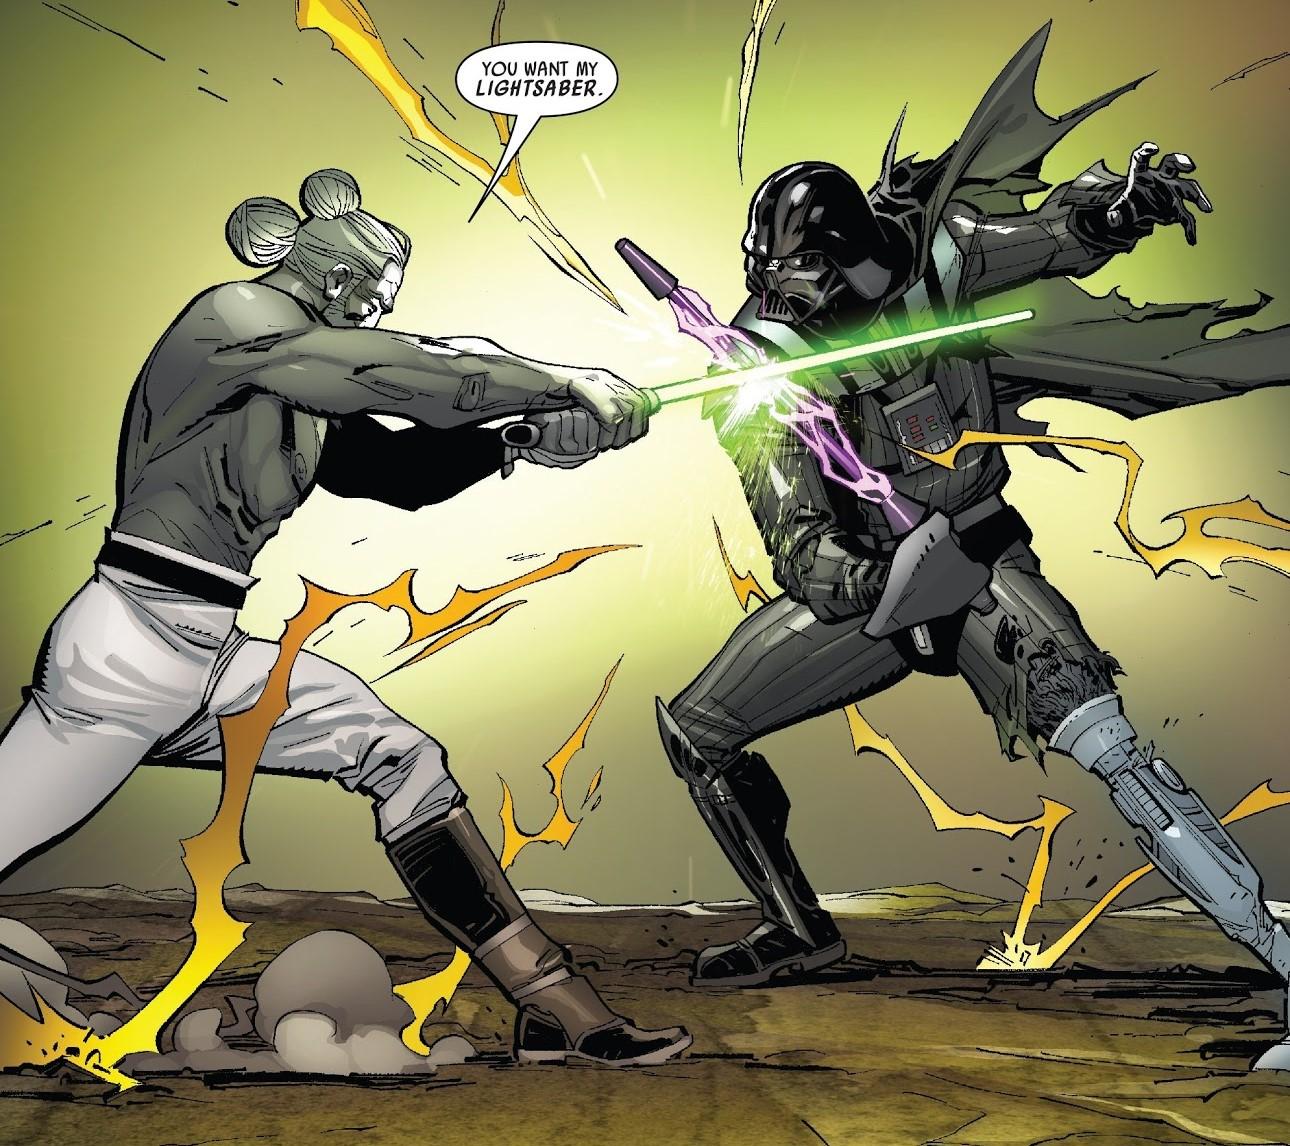 Kirak_Vader_duel.jpg